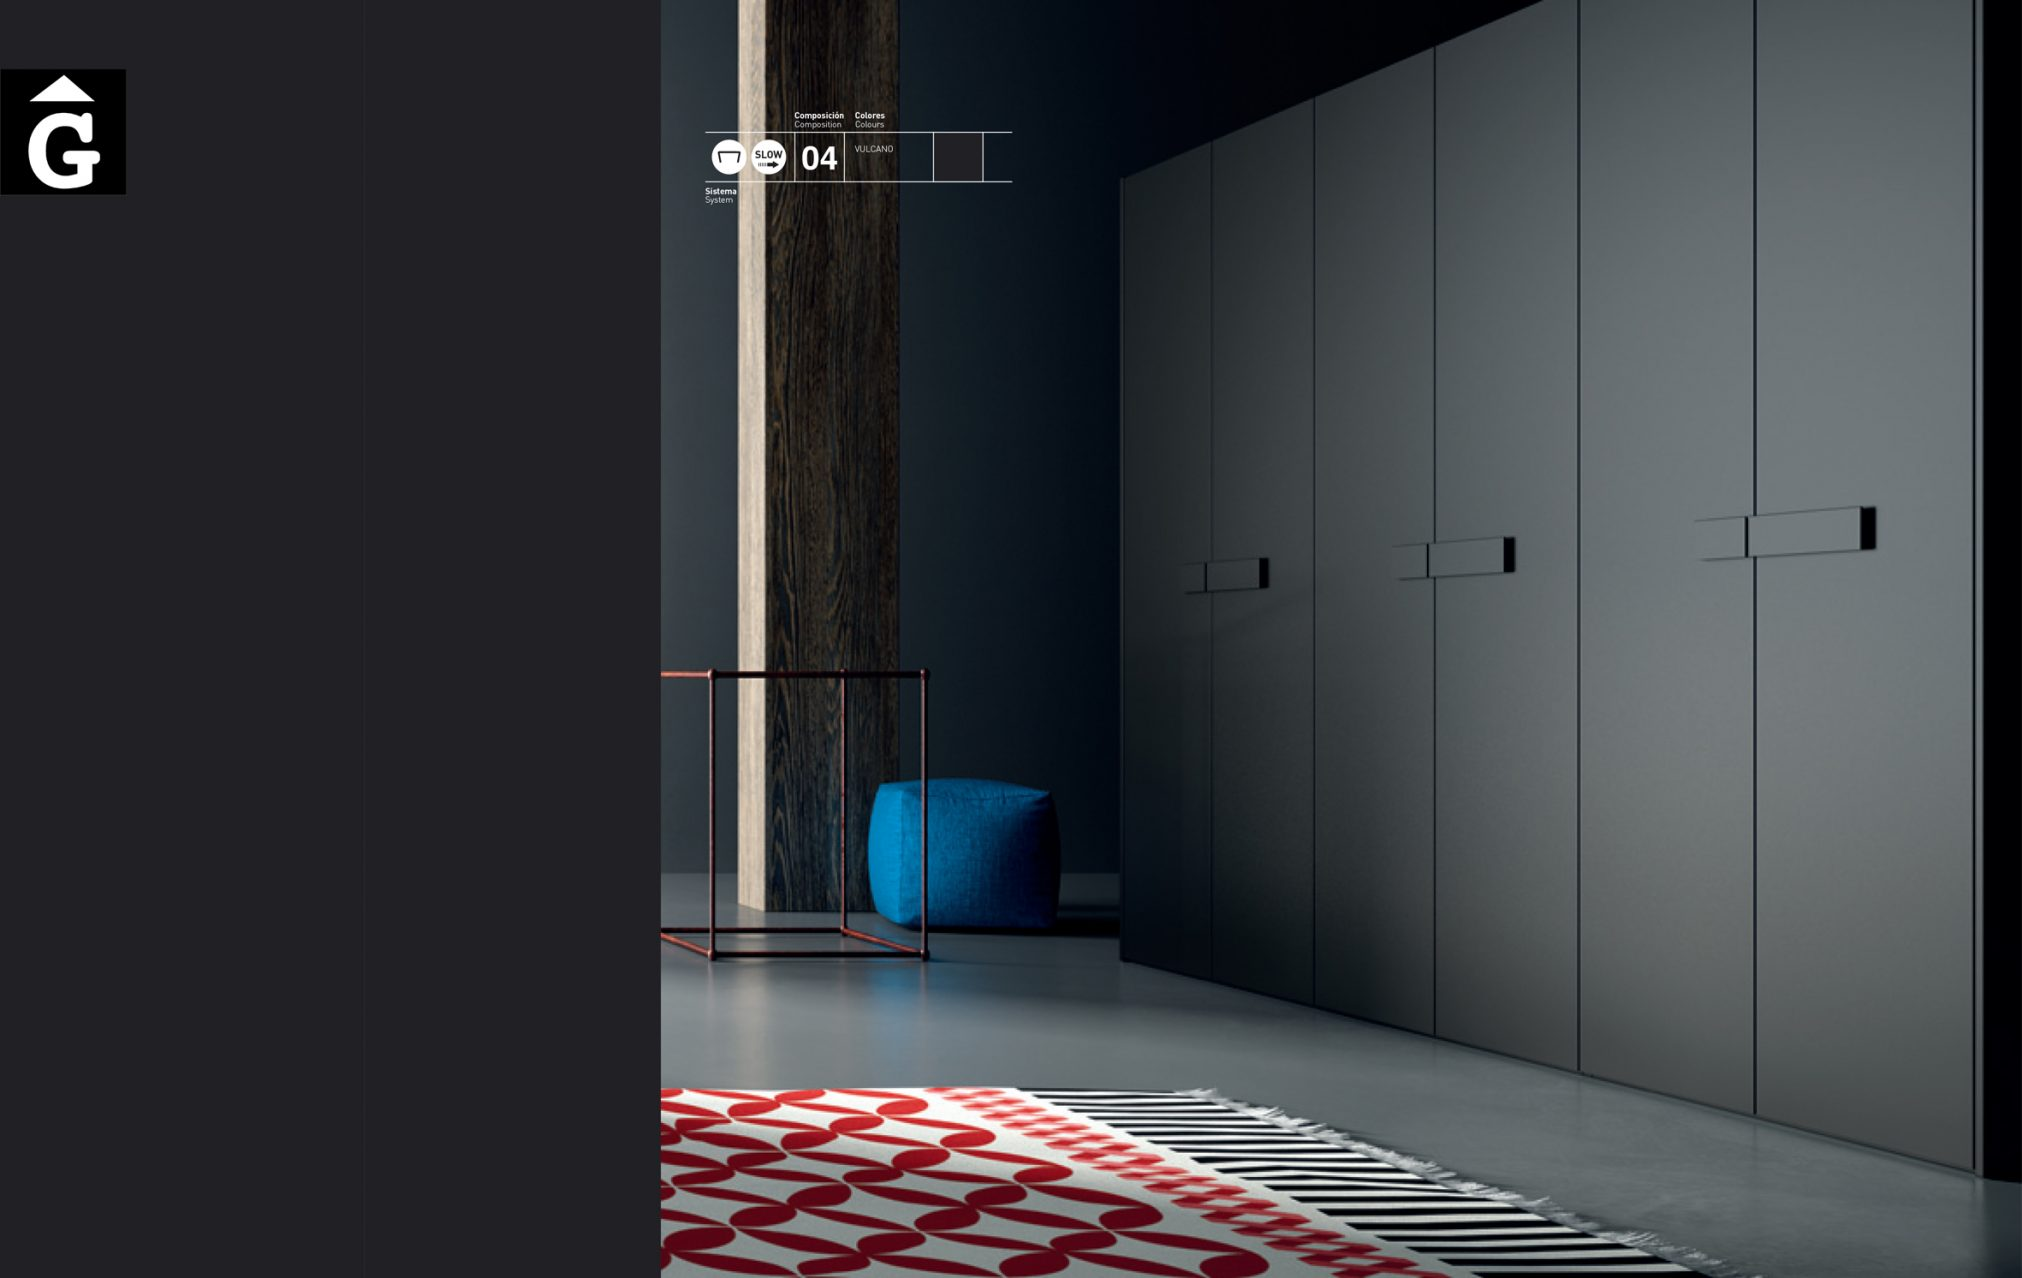 Armari negre 15 JJP NoLimits by Mobles GIFREU Girona modern minim elegant atemporal